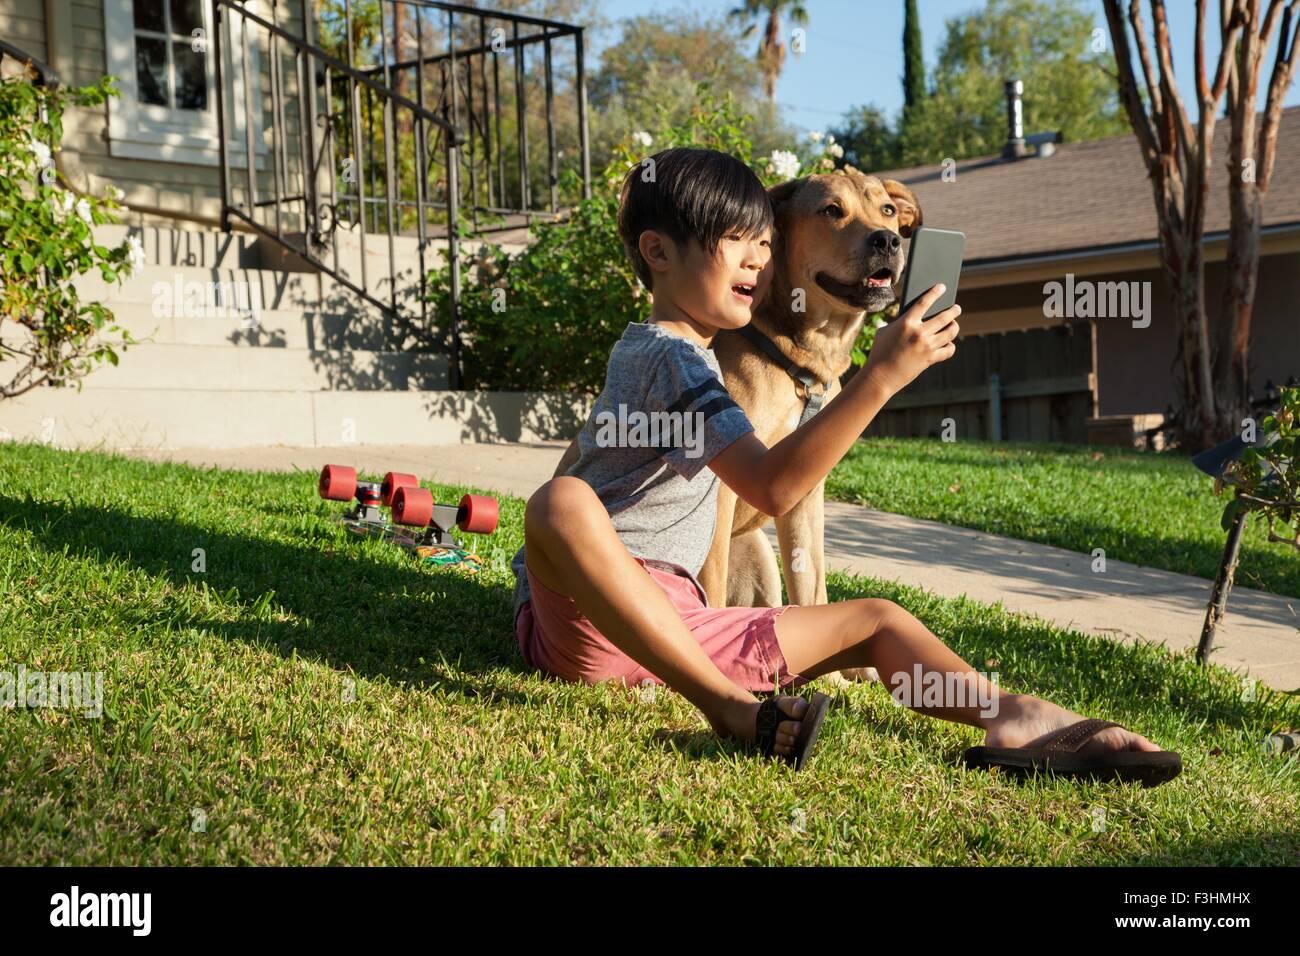 Boy posing for smartphone selfie with dog in garden - Stock Image